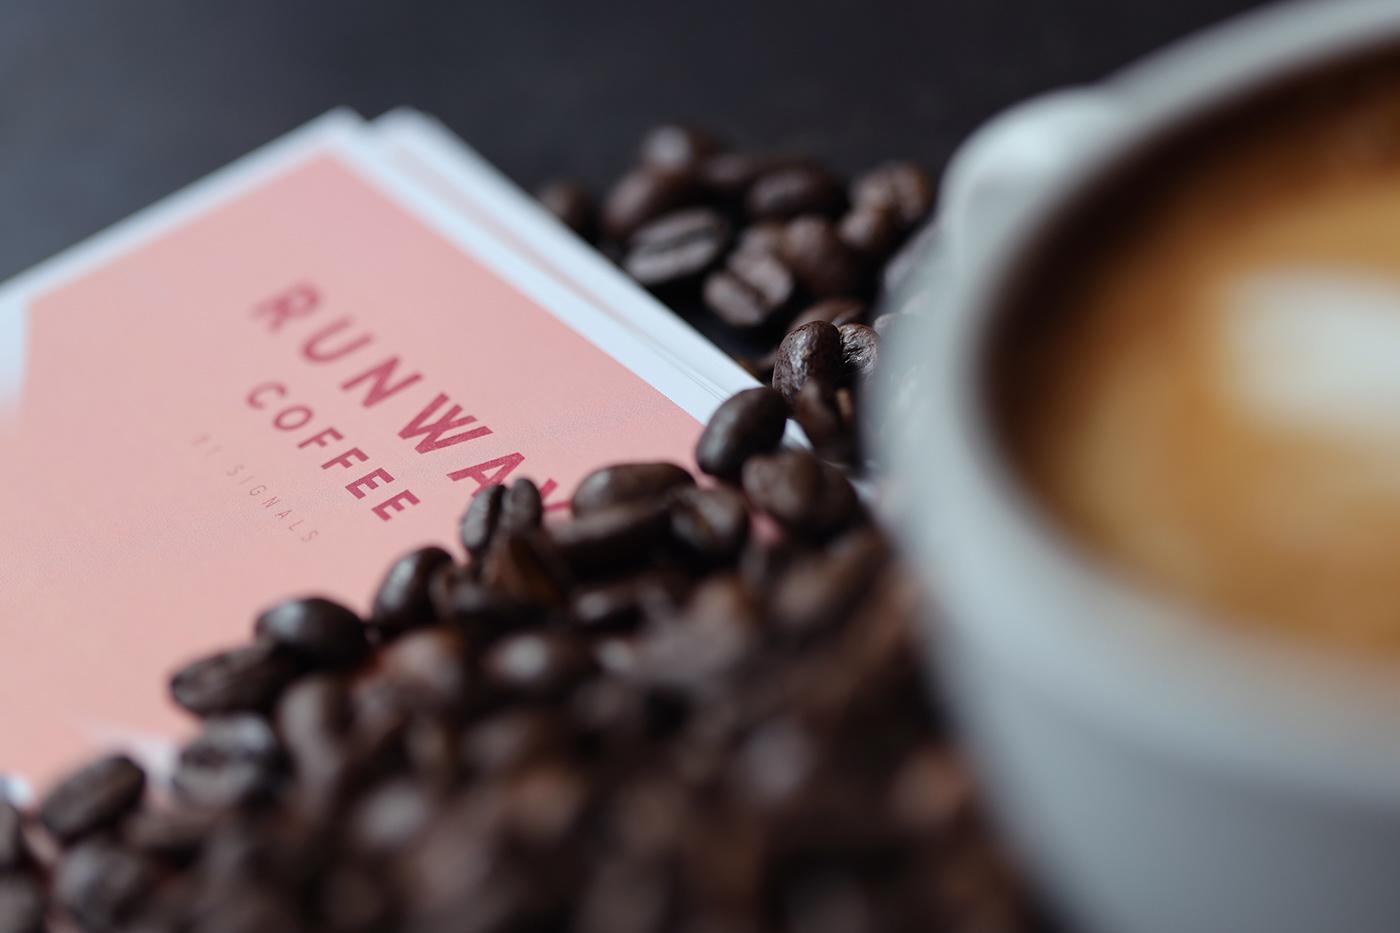 brand brand identity design branding  Coffee graphic design  Identity Design logo packaging design ILLUSTRATION